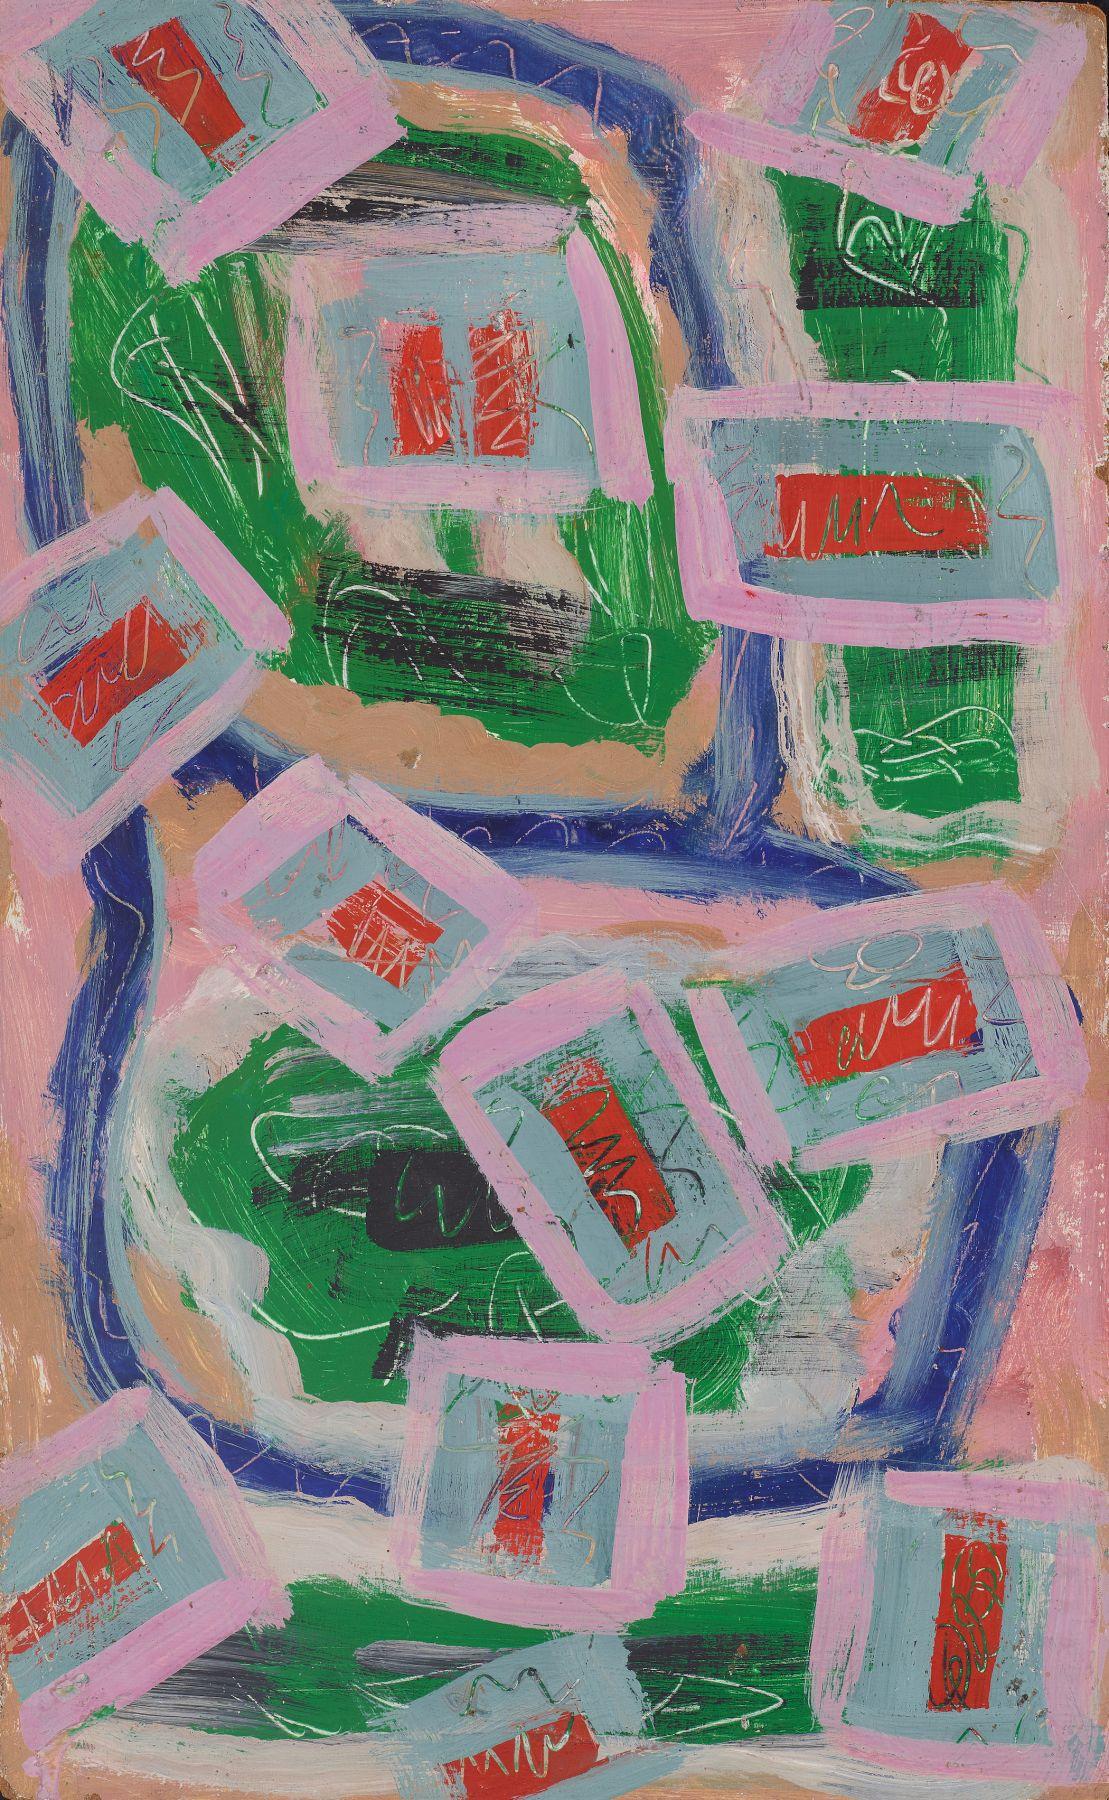 Untitled (c. 1950)